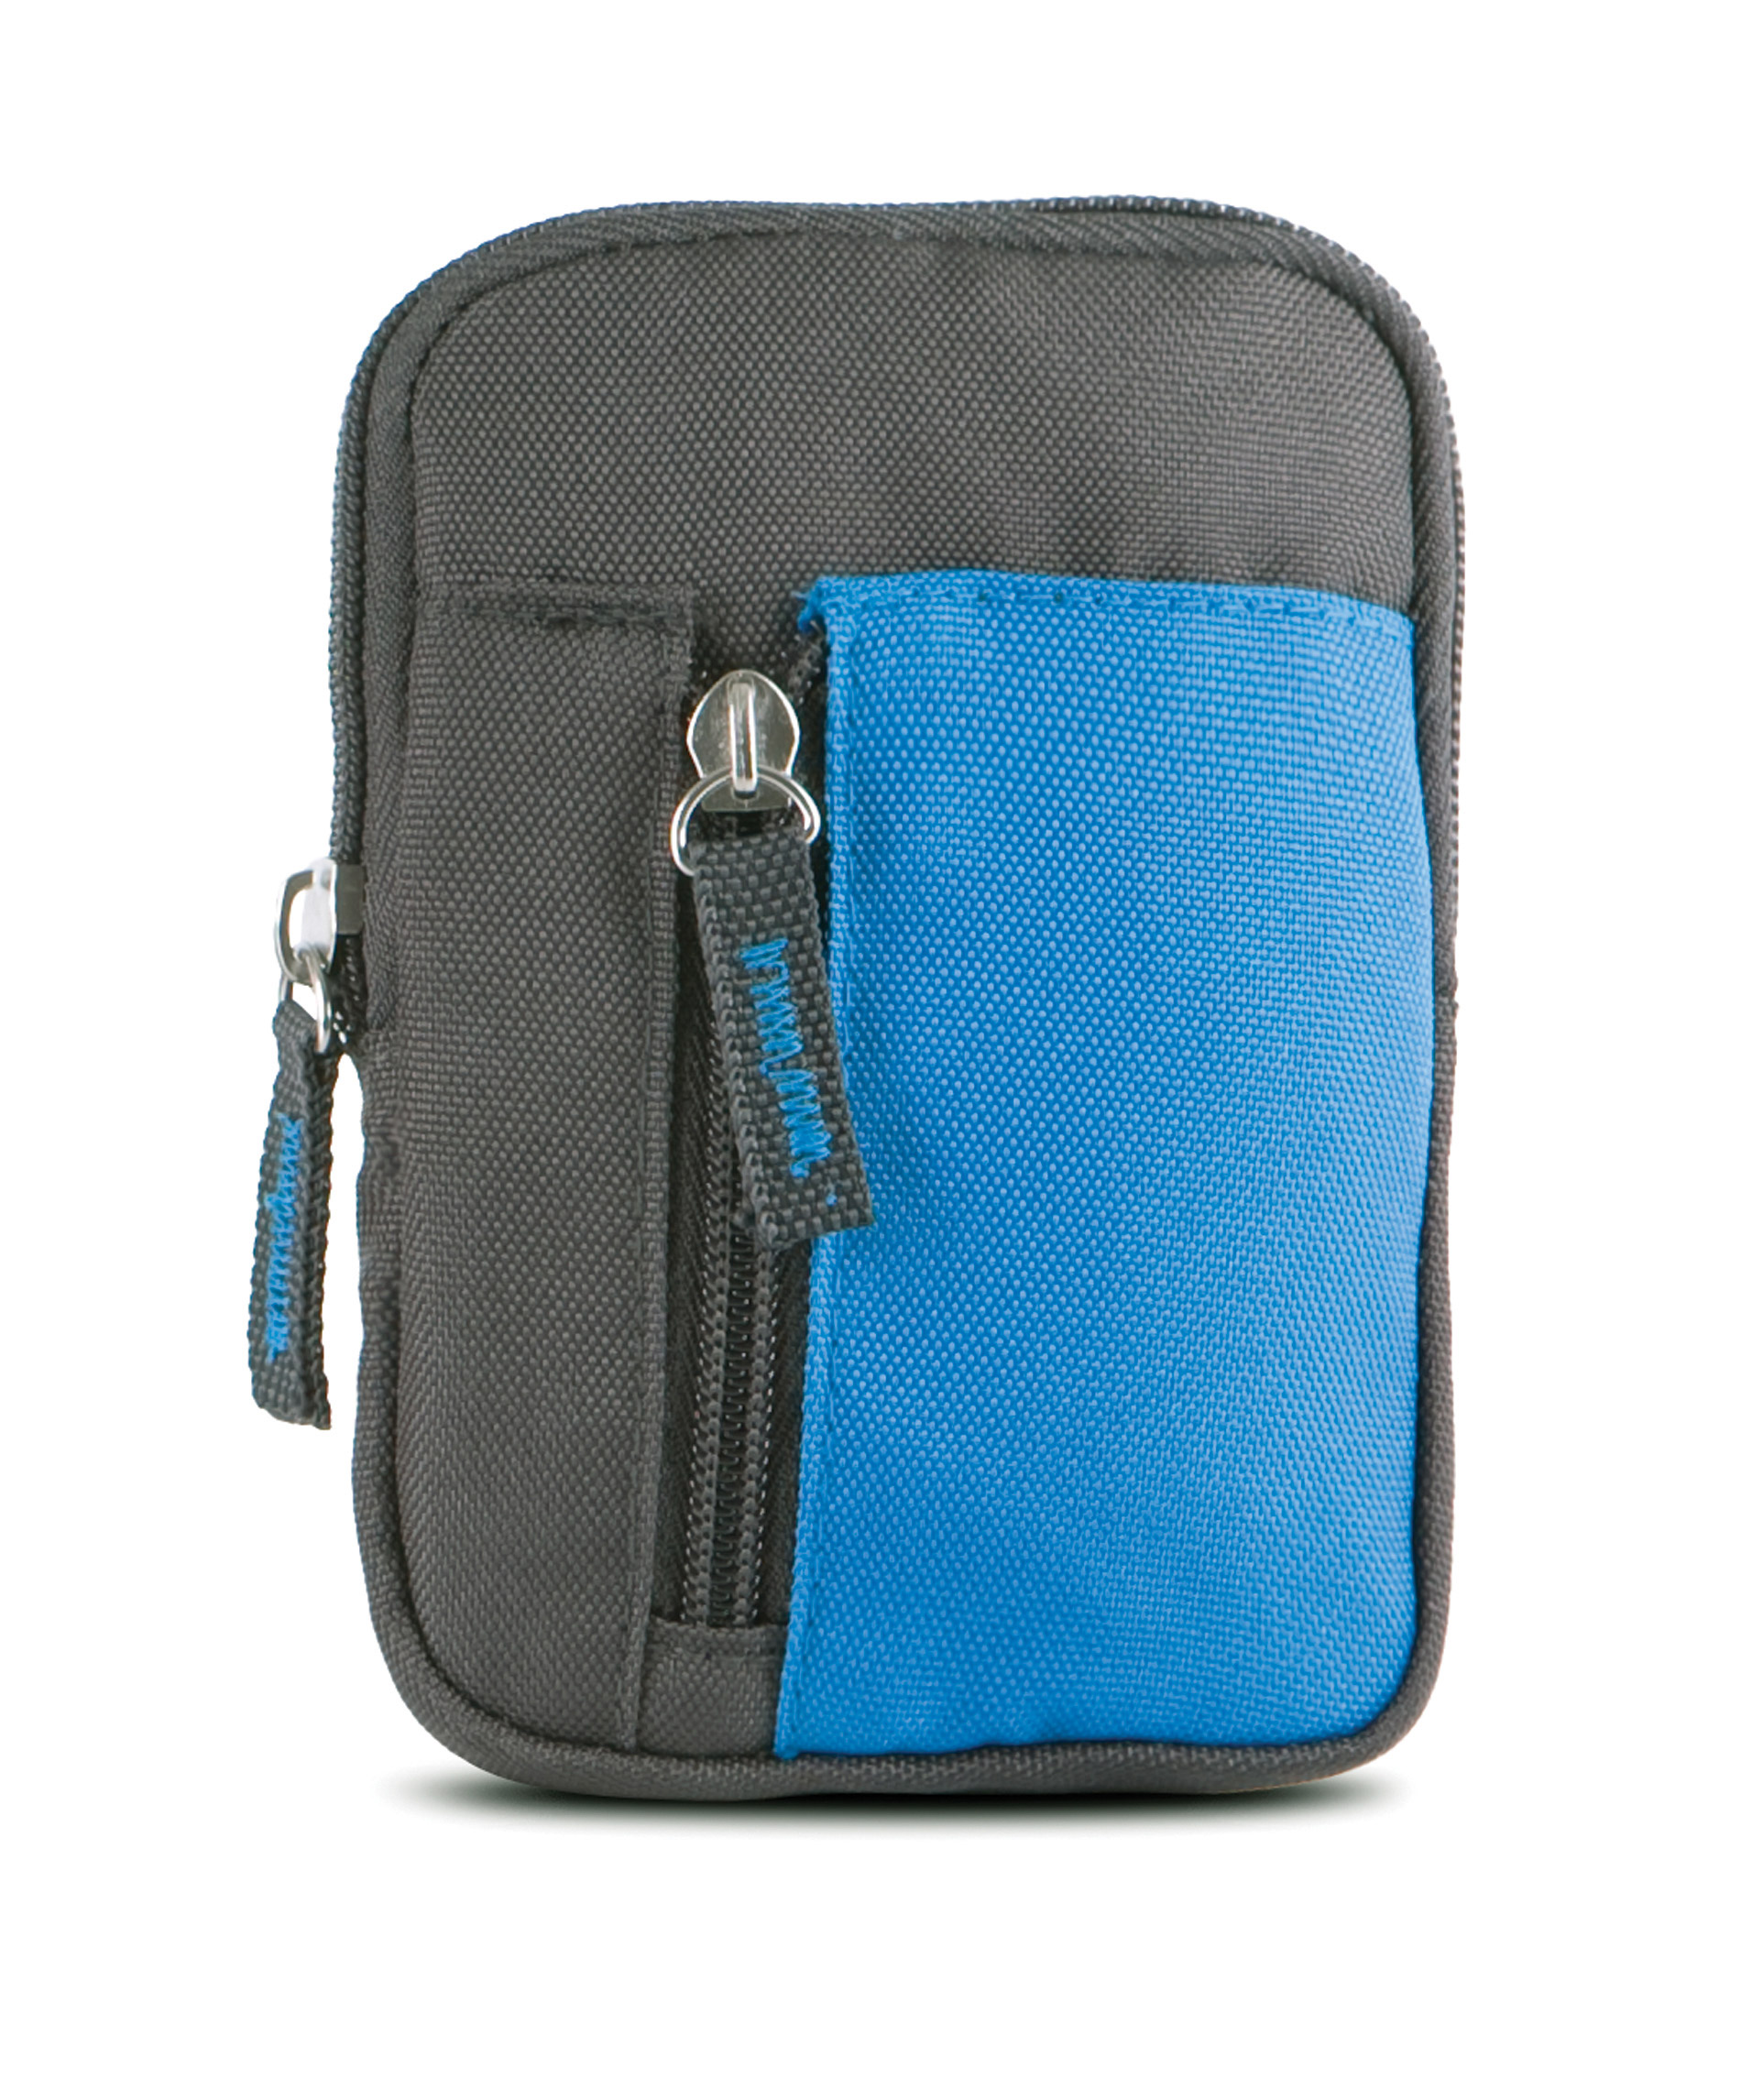 portemonnee ki0502 donkergrijs / aqua blauw